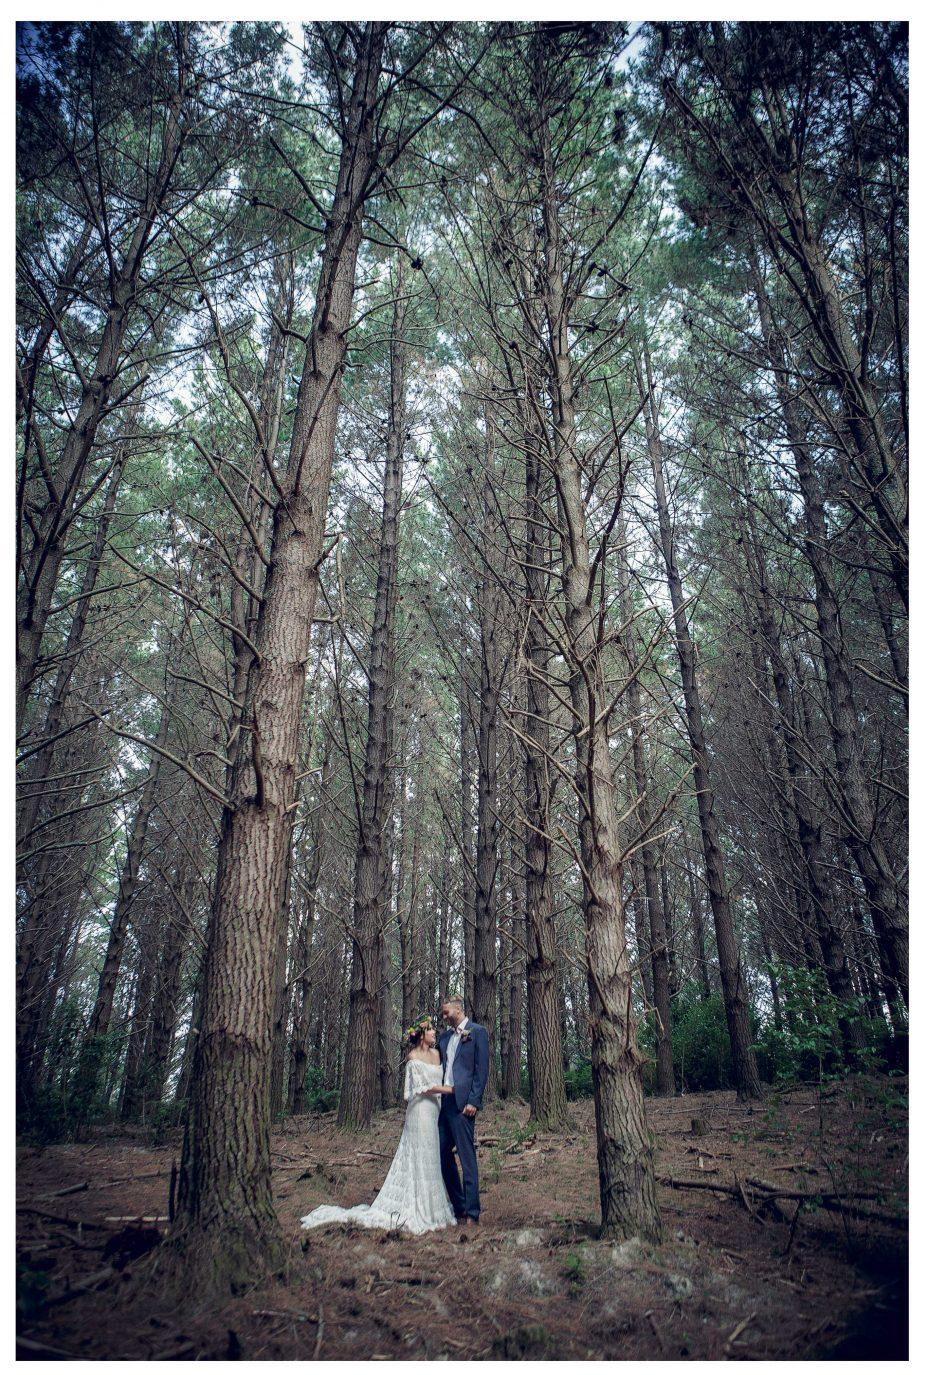 Creative wedding shoot,Bride and groom amoung huge trees, Riverhead Forrest wedding photo, Kumeu Valley